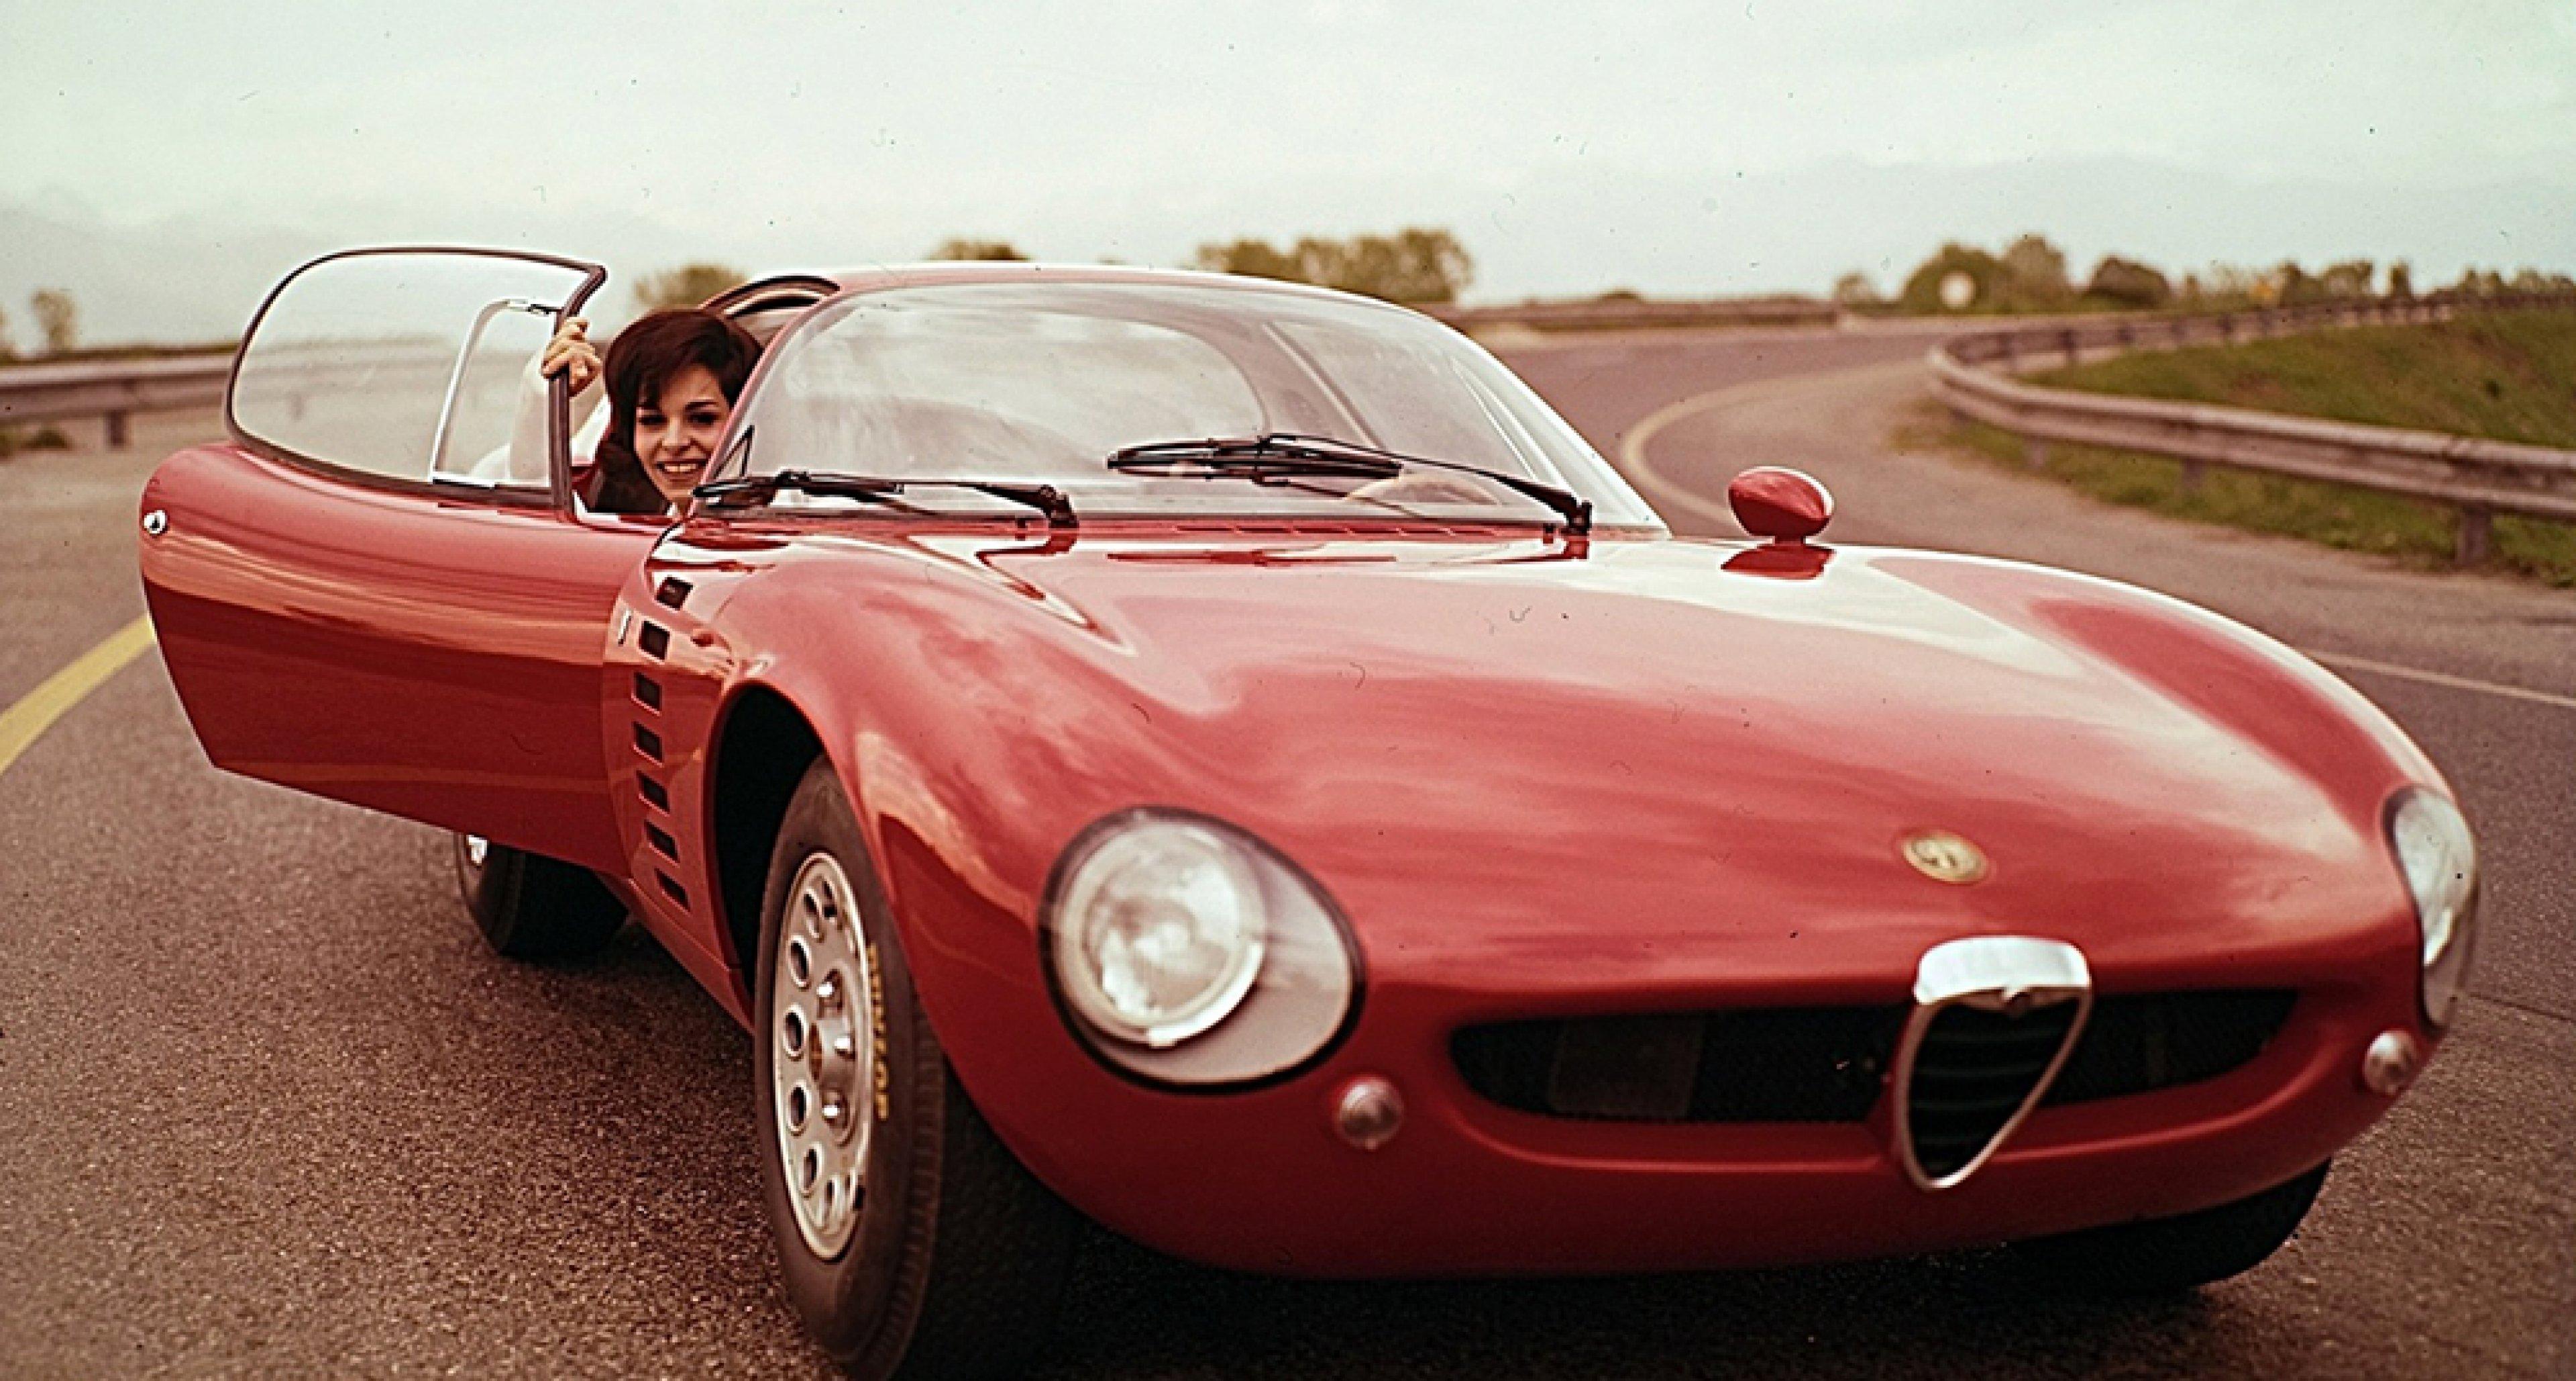 The Alfa Romeo Canguro concept unveiled at the 1964 Turin Motor Show.